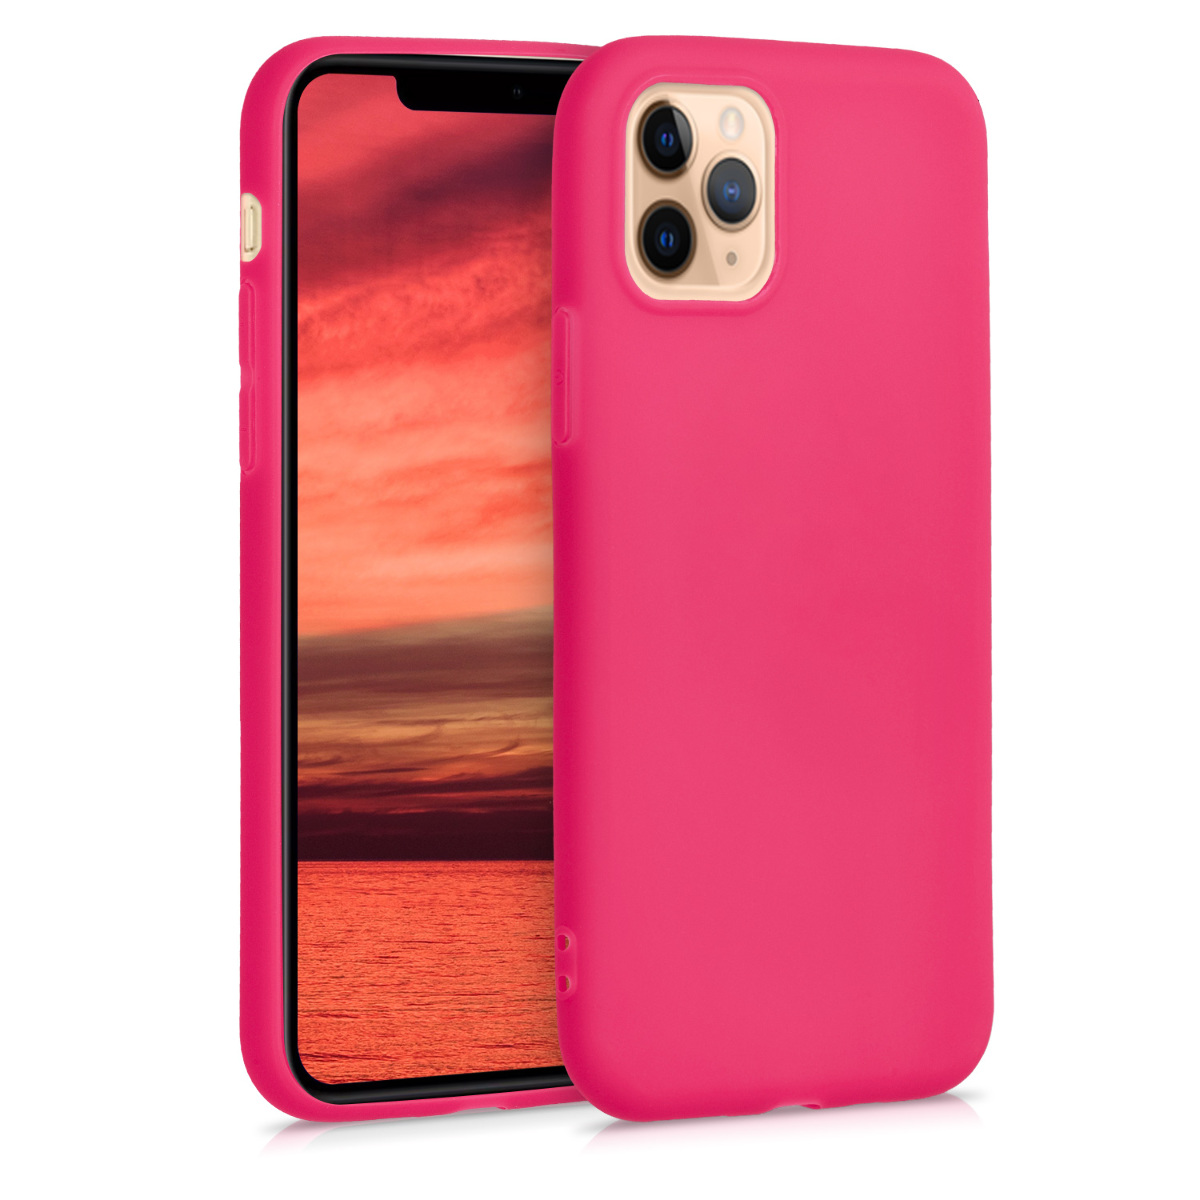 KW Θήκη Σιλικόνης Apple iPhone 11 Pro Max - Neon Pink (49782.77)